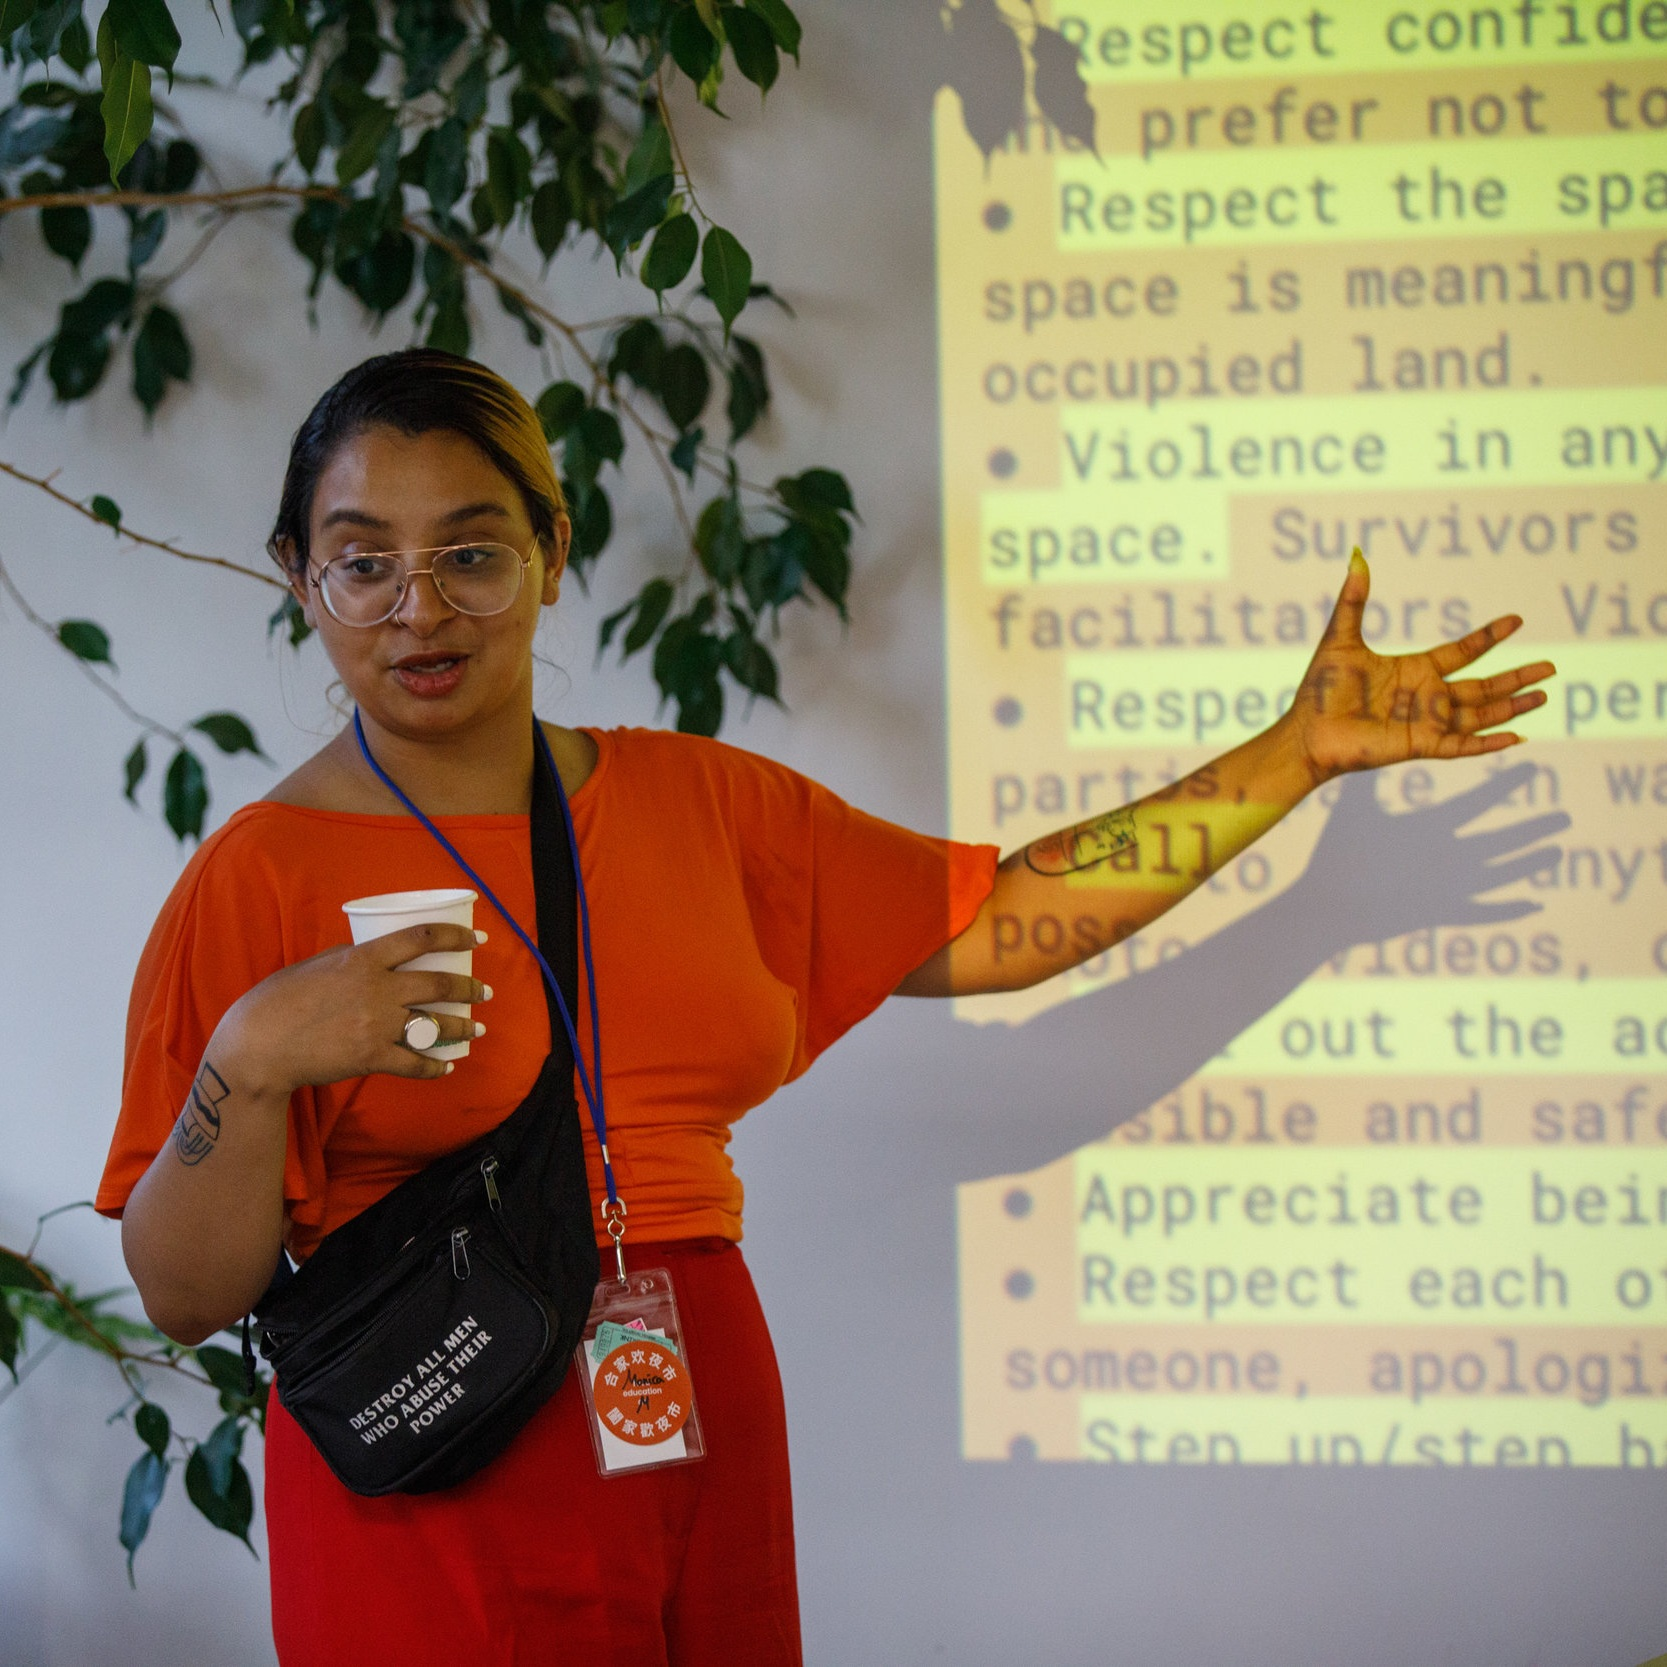 Monica Mohapatra of SADAC. Photo courtesy of Stephen Yang.